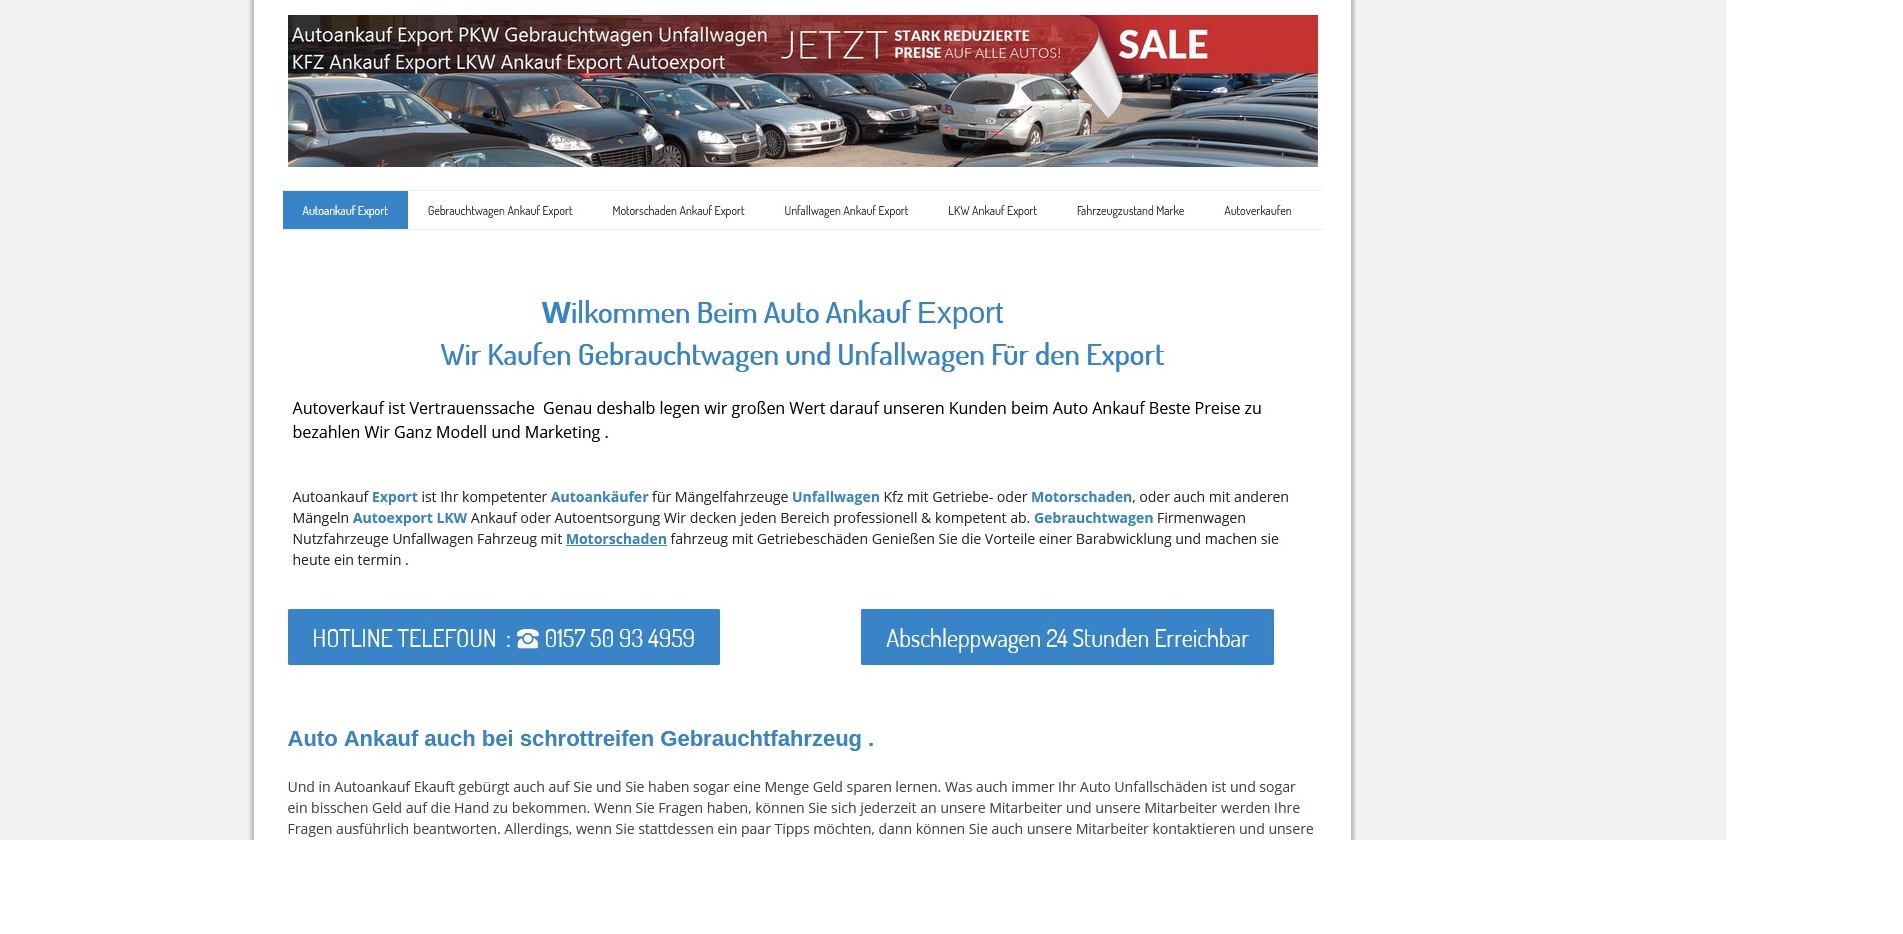 https://www.kfz-ankauf-export.de - Autoankauf Greven